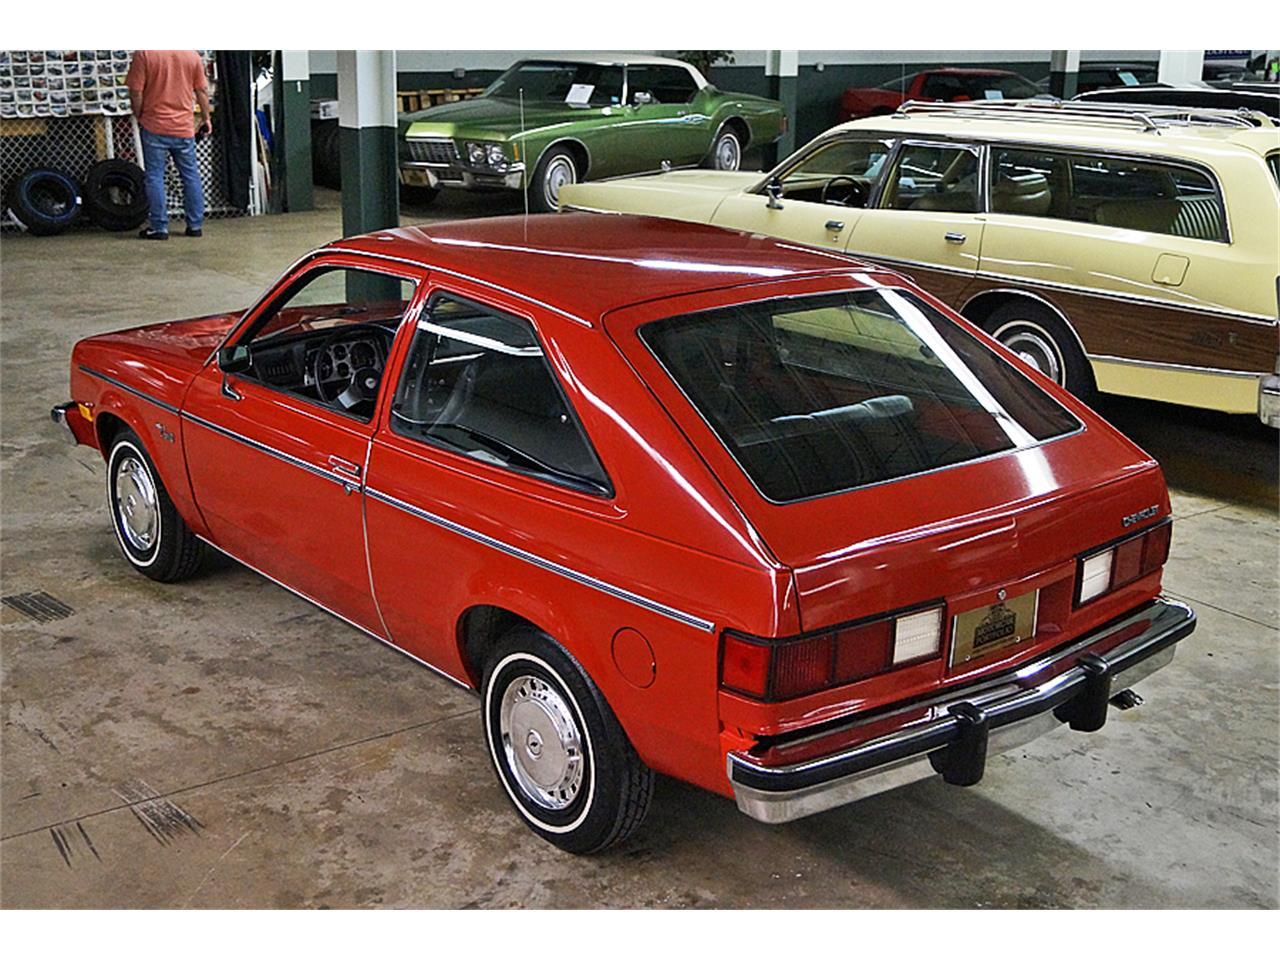 1980 chevrolet chevette for sale classiccars com cc 964806 1980 chevrolet chevette for sale